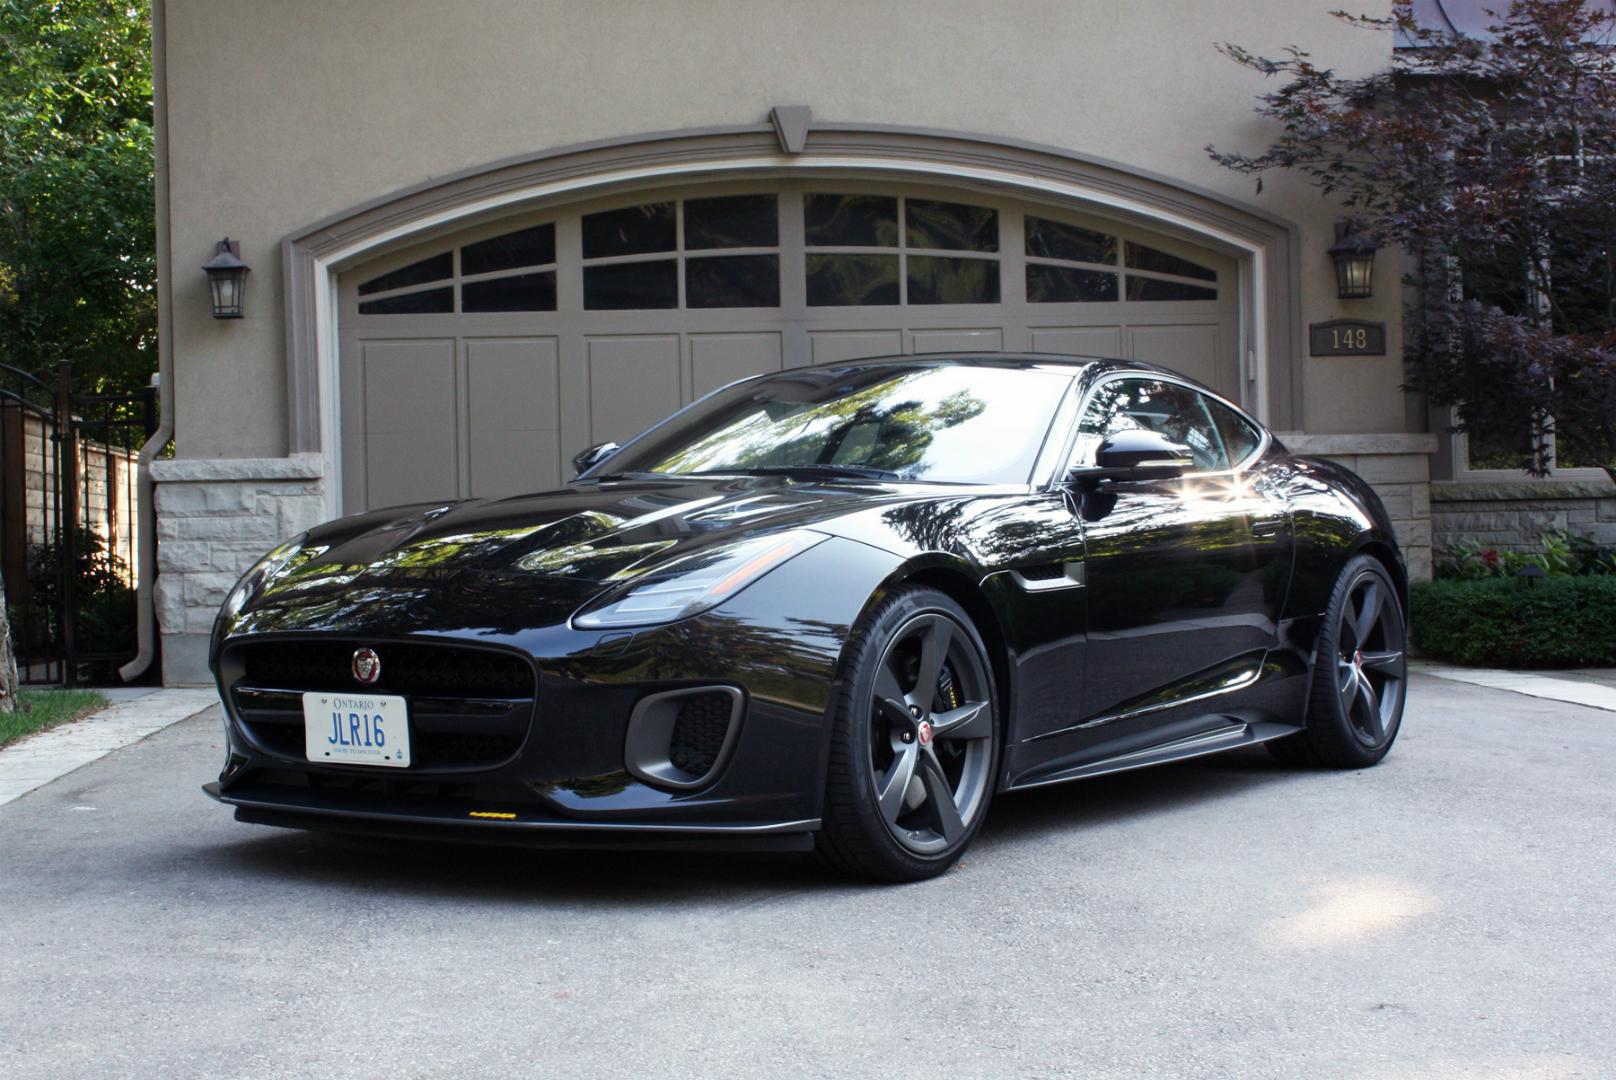 2018 Jaguar F-Type 400 Sport review